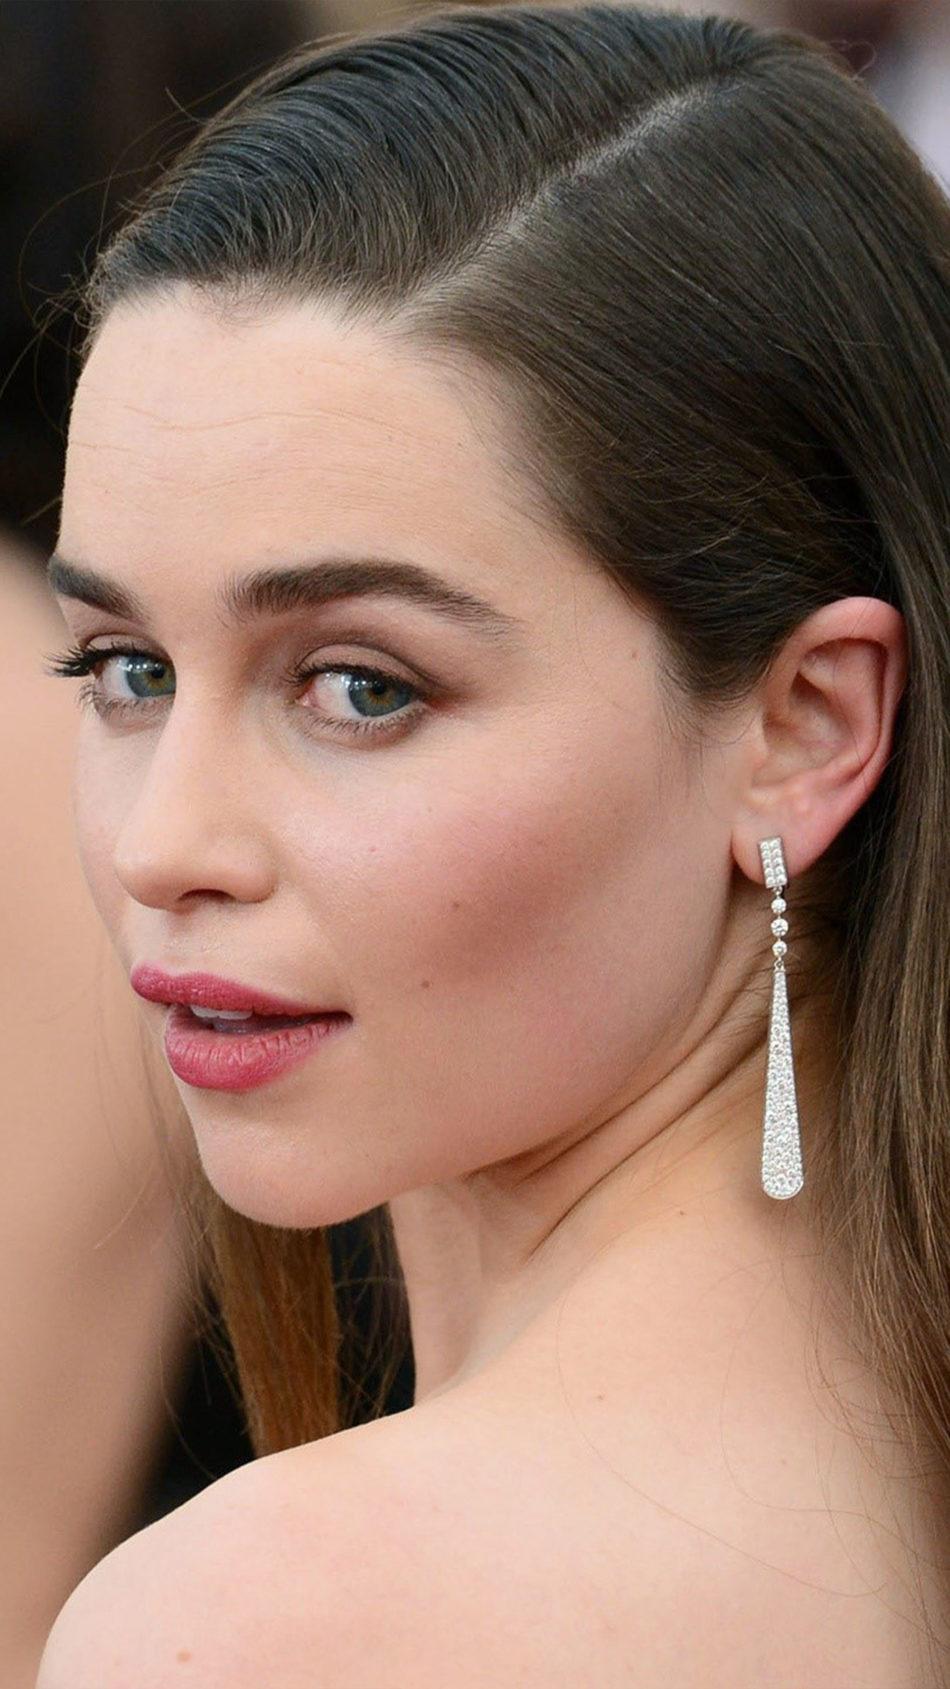 GOT Actress Emilia Clarke 4K Ultra HD Mobile Wallpaper